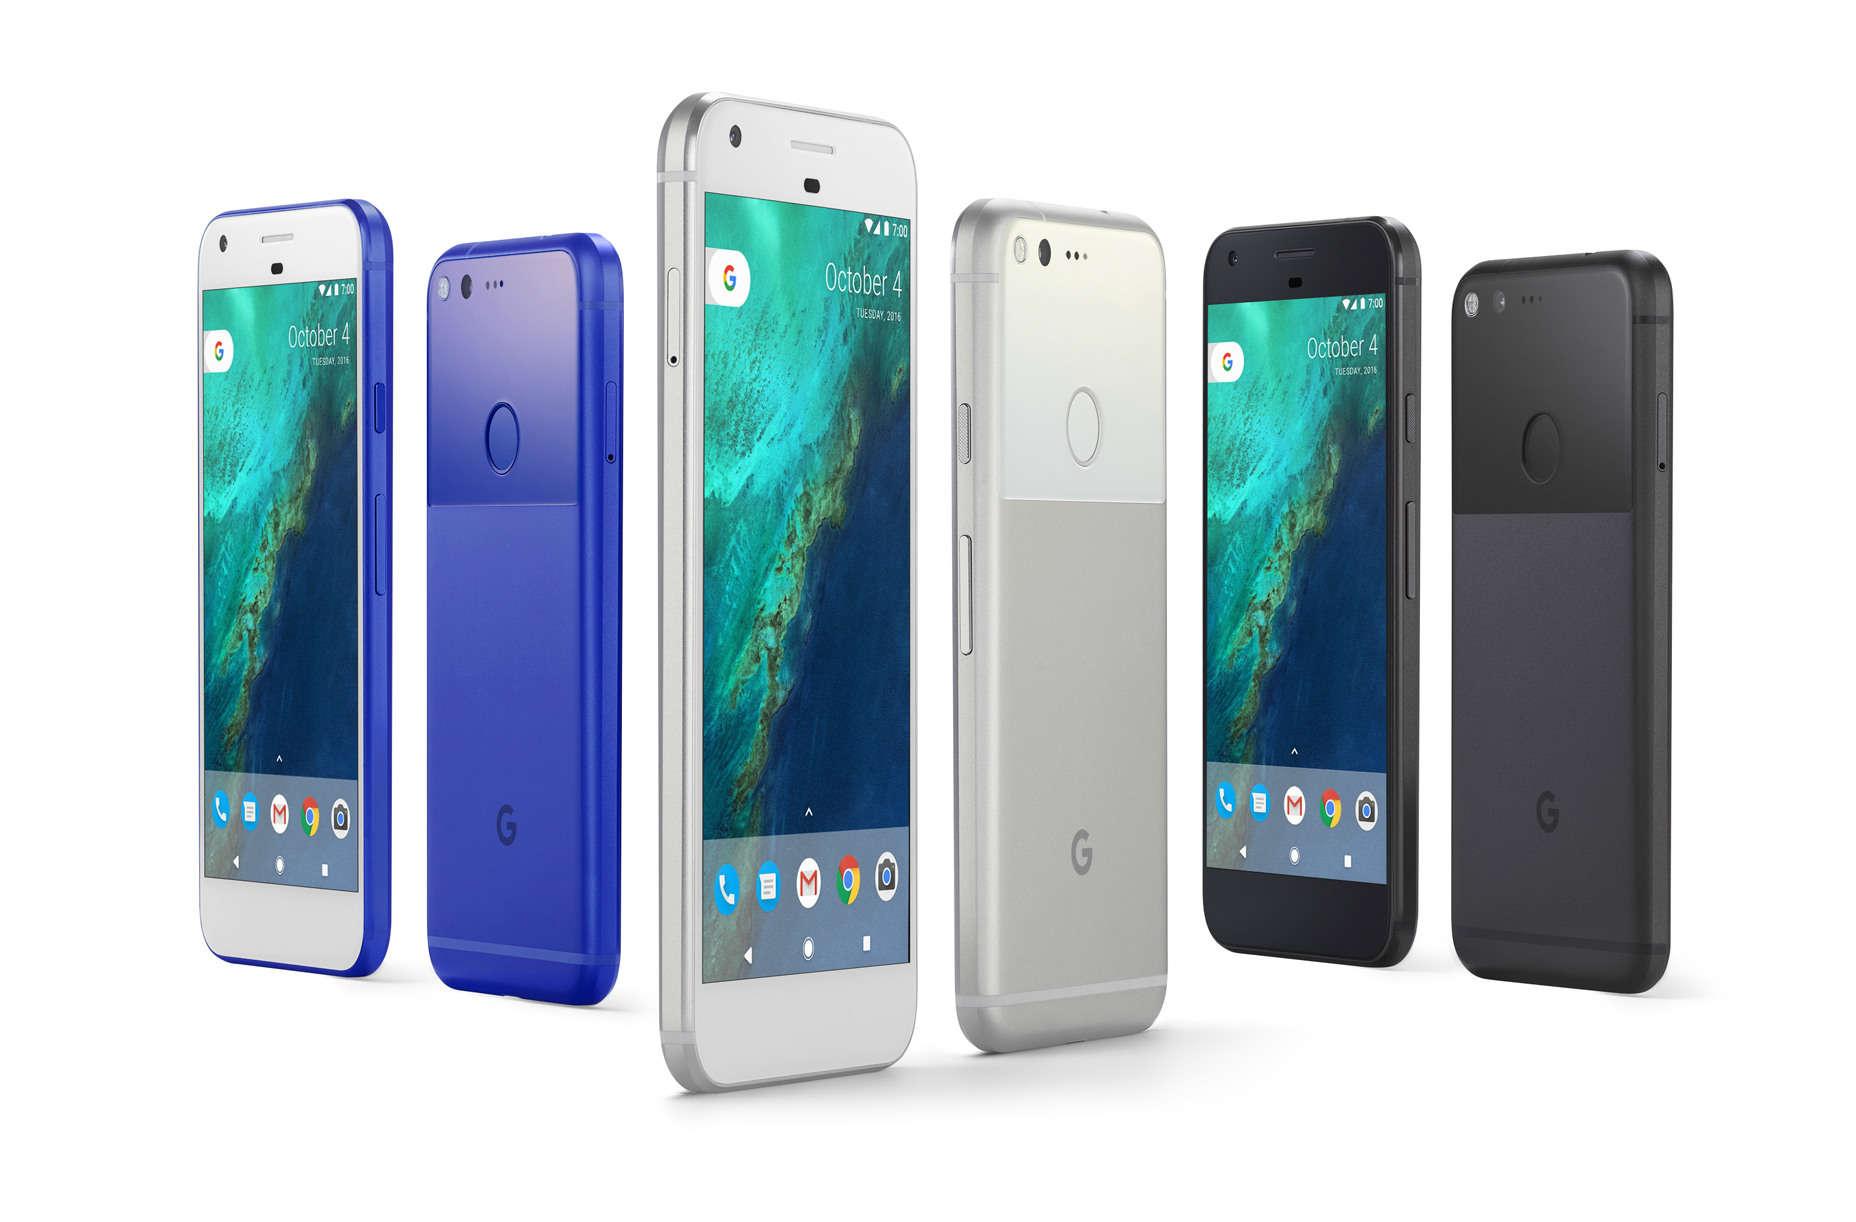 Google Pixel phone family